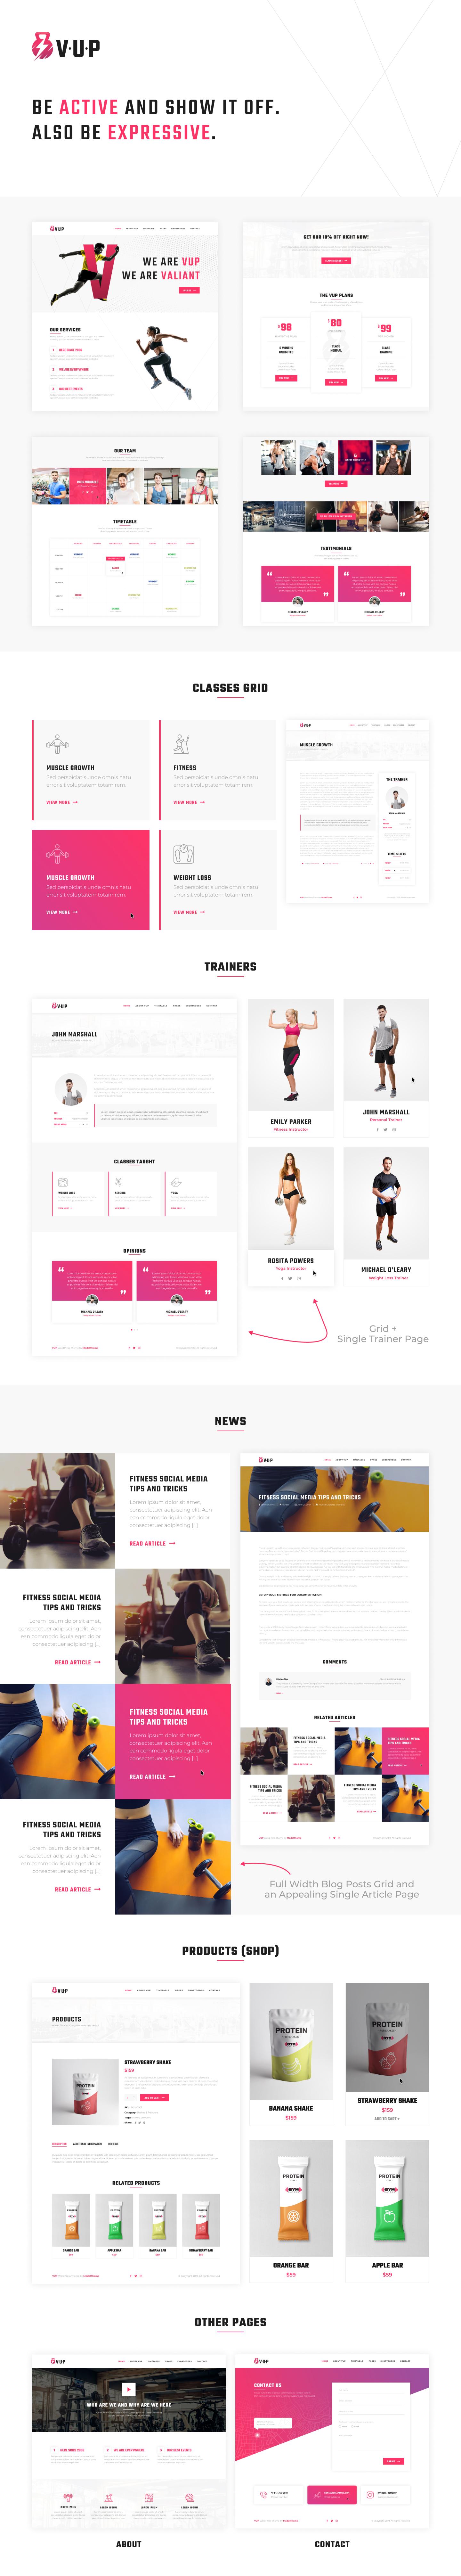 VUP - Fitness Center WordPress Theme - 1